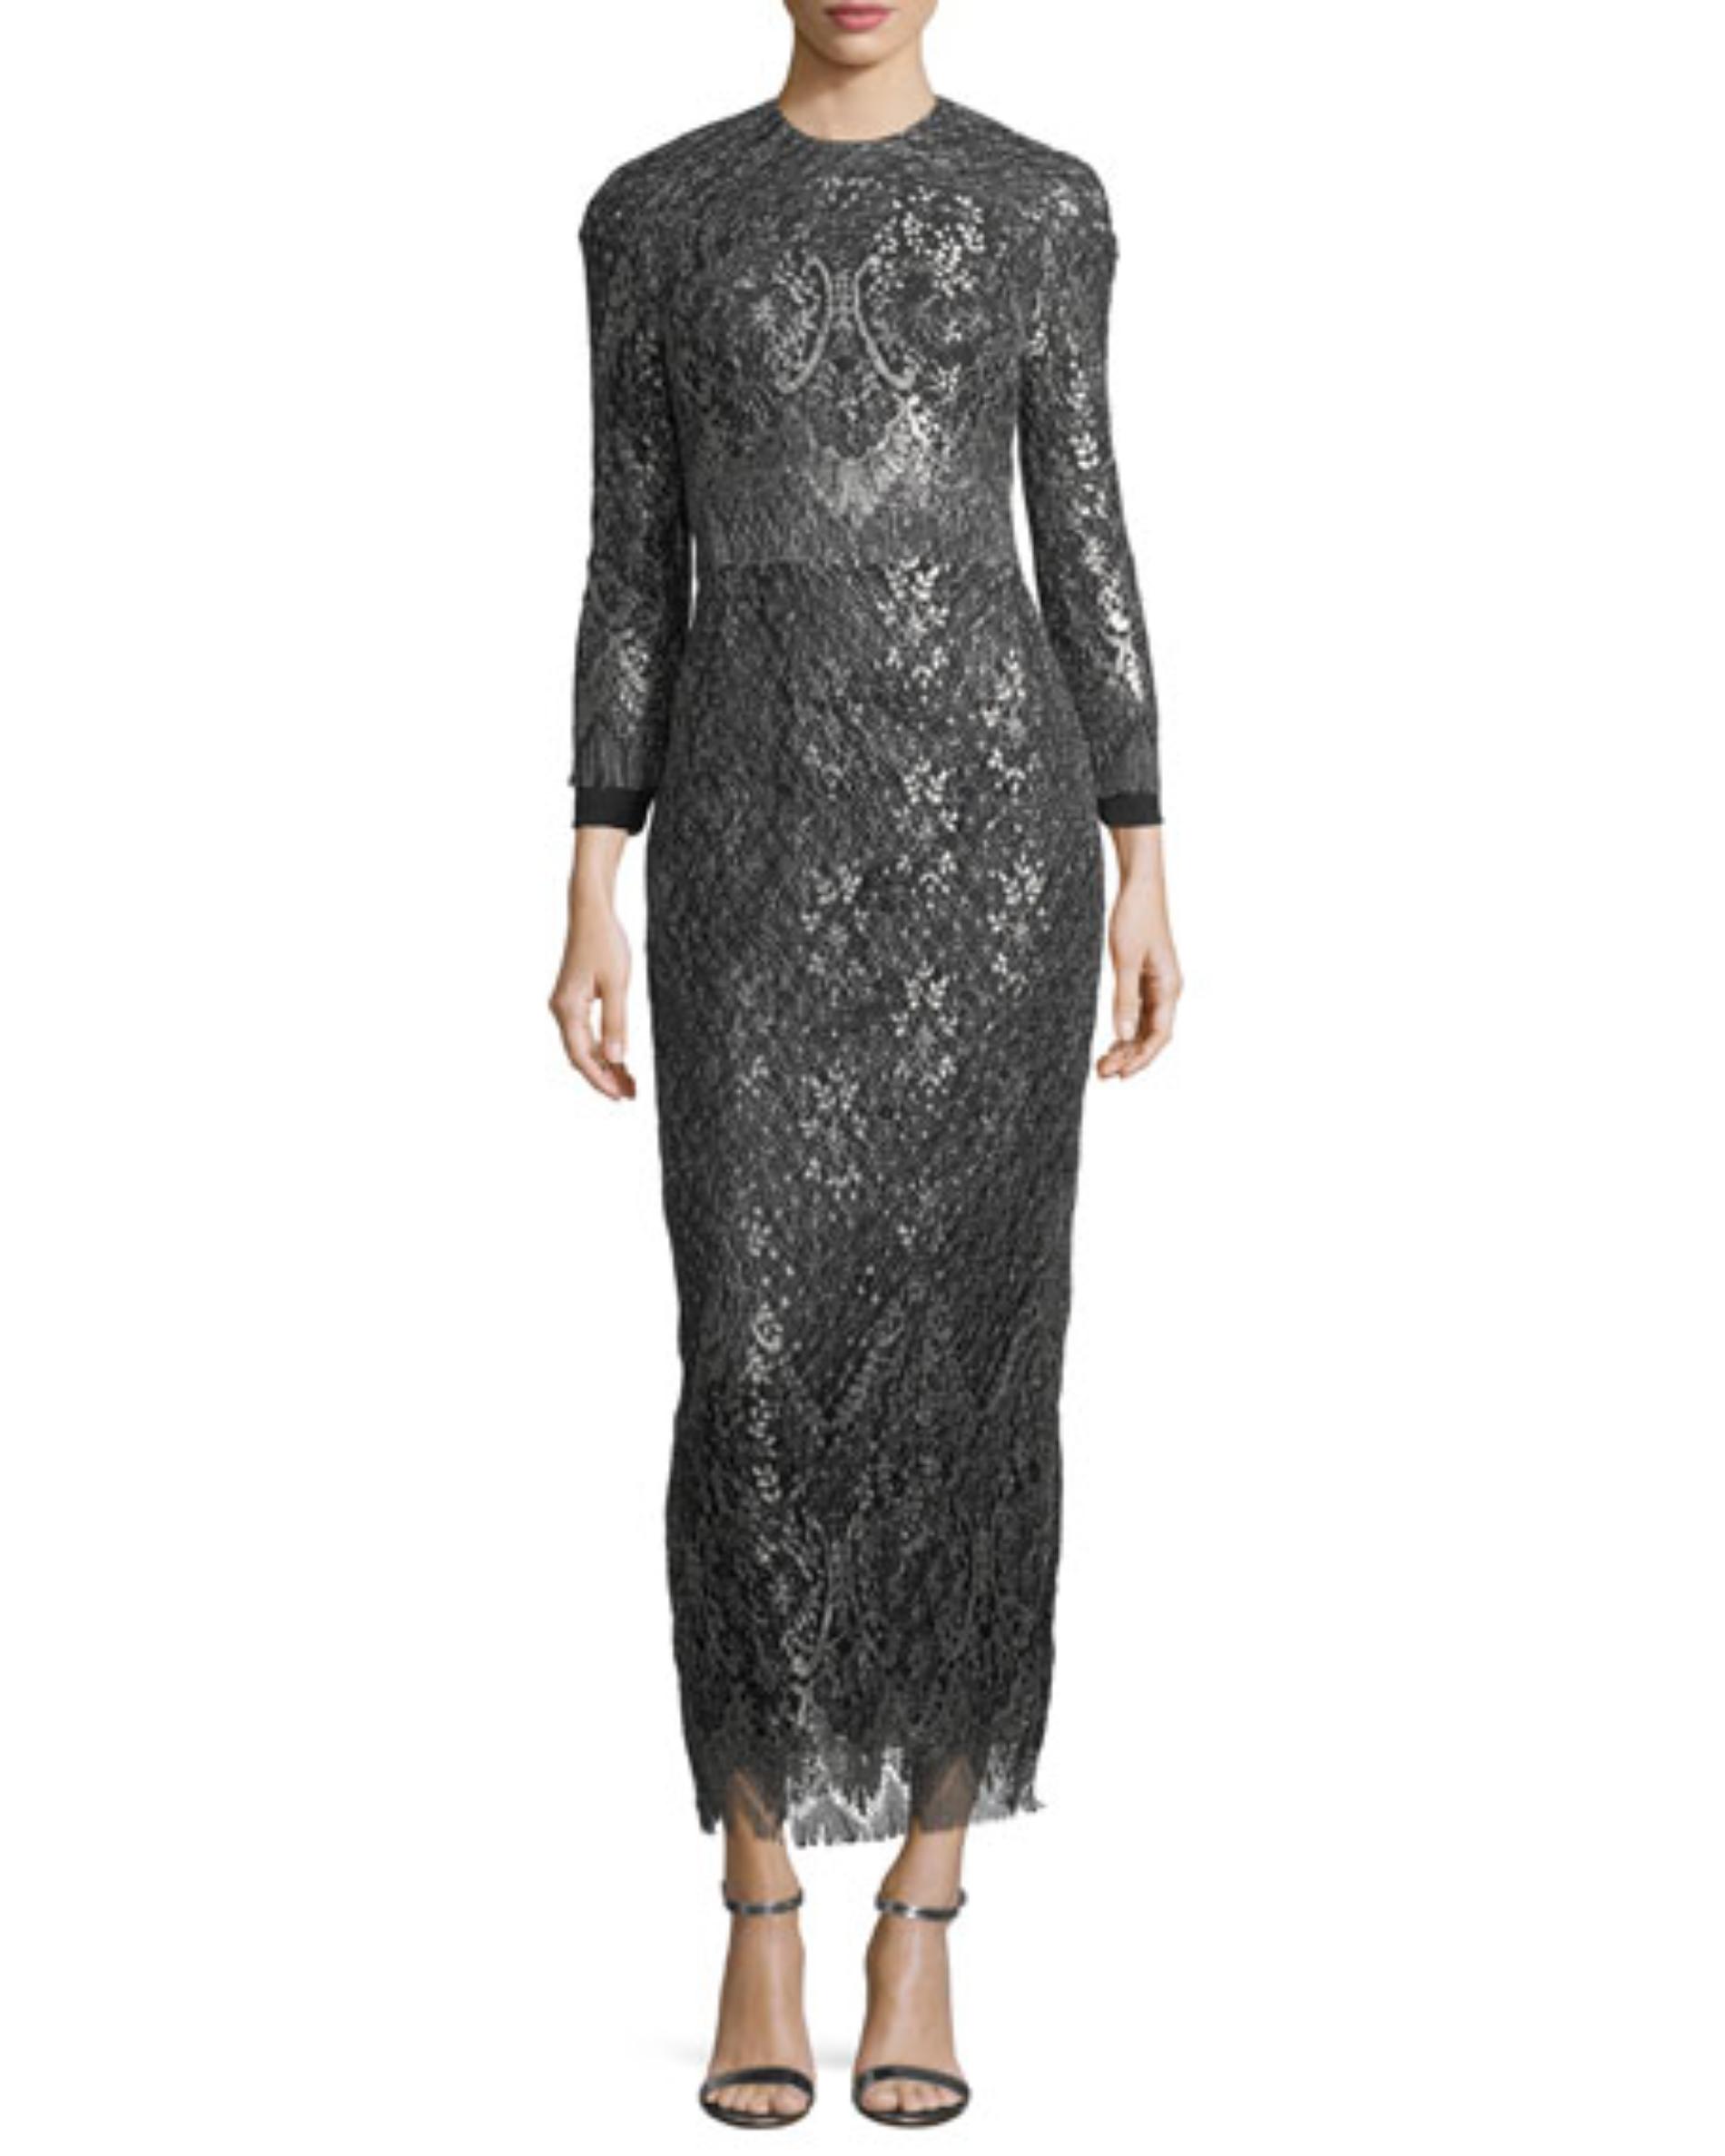 long sleeve silver dress